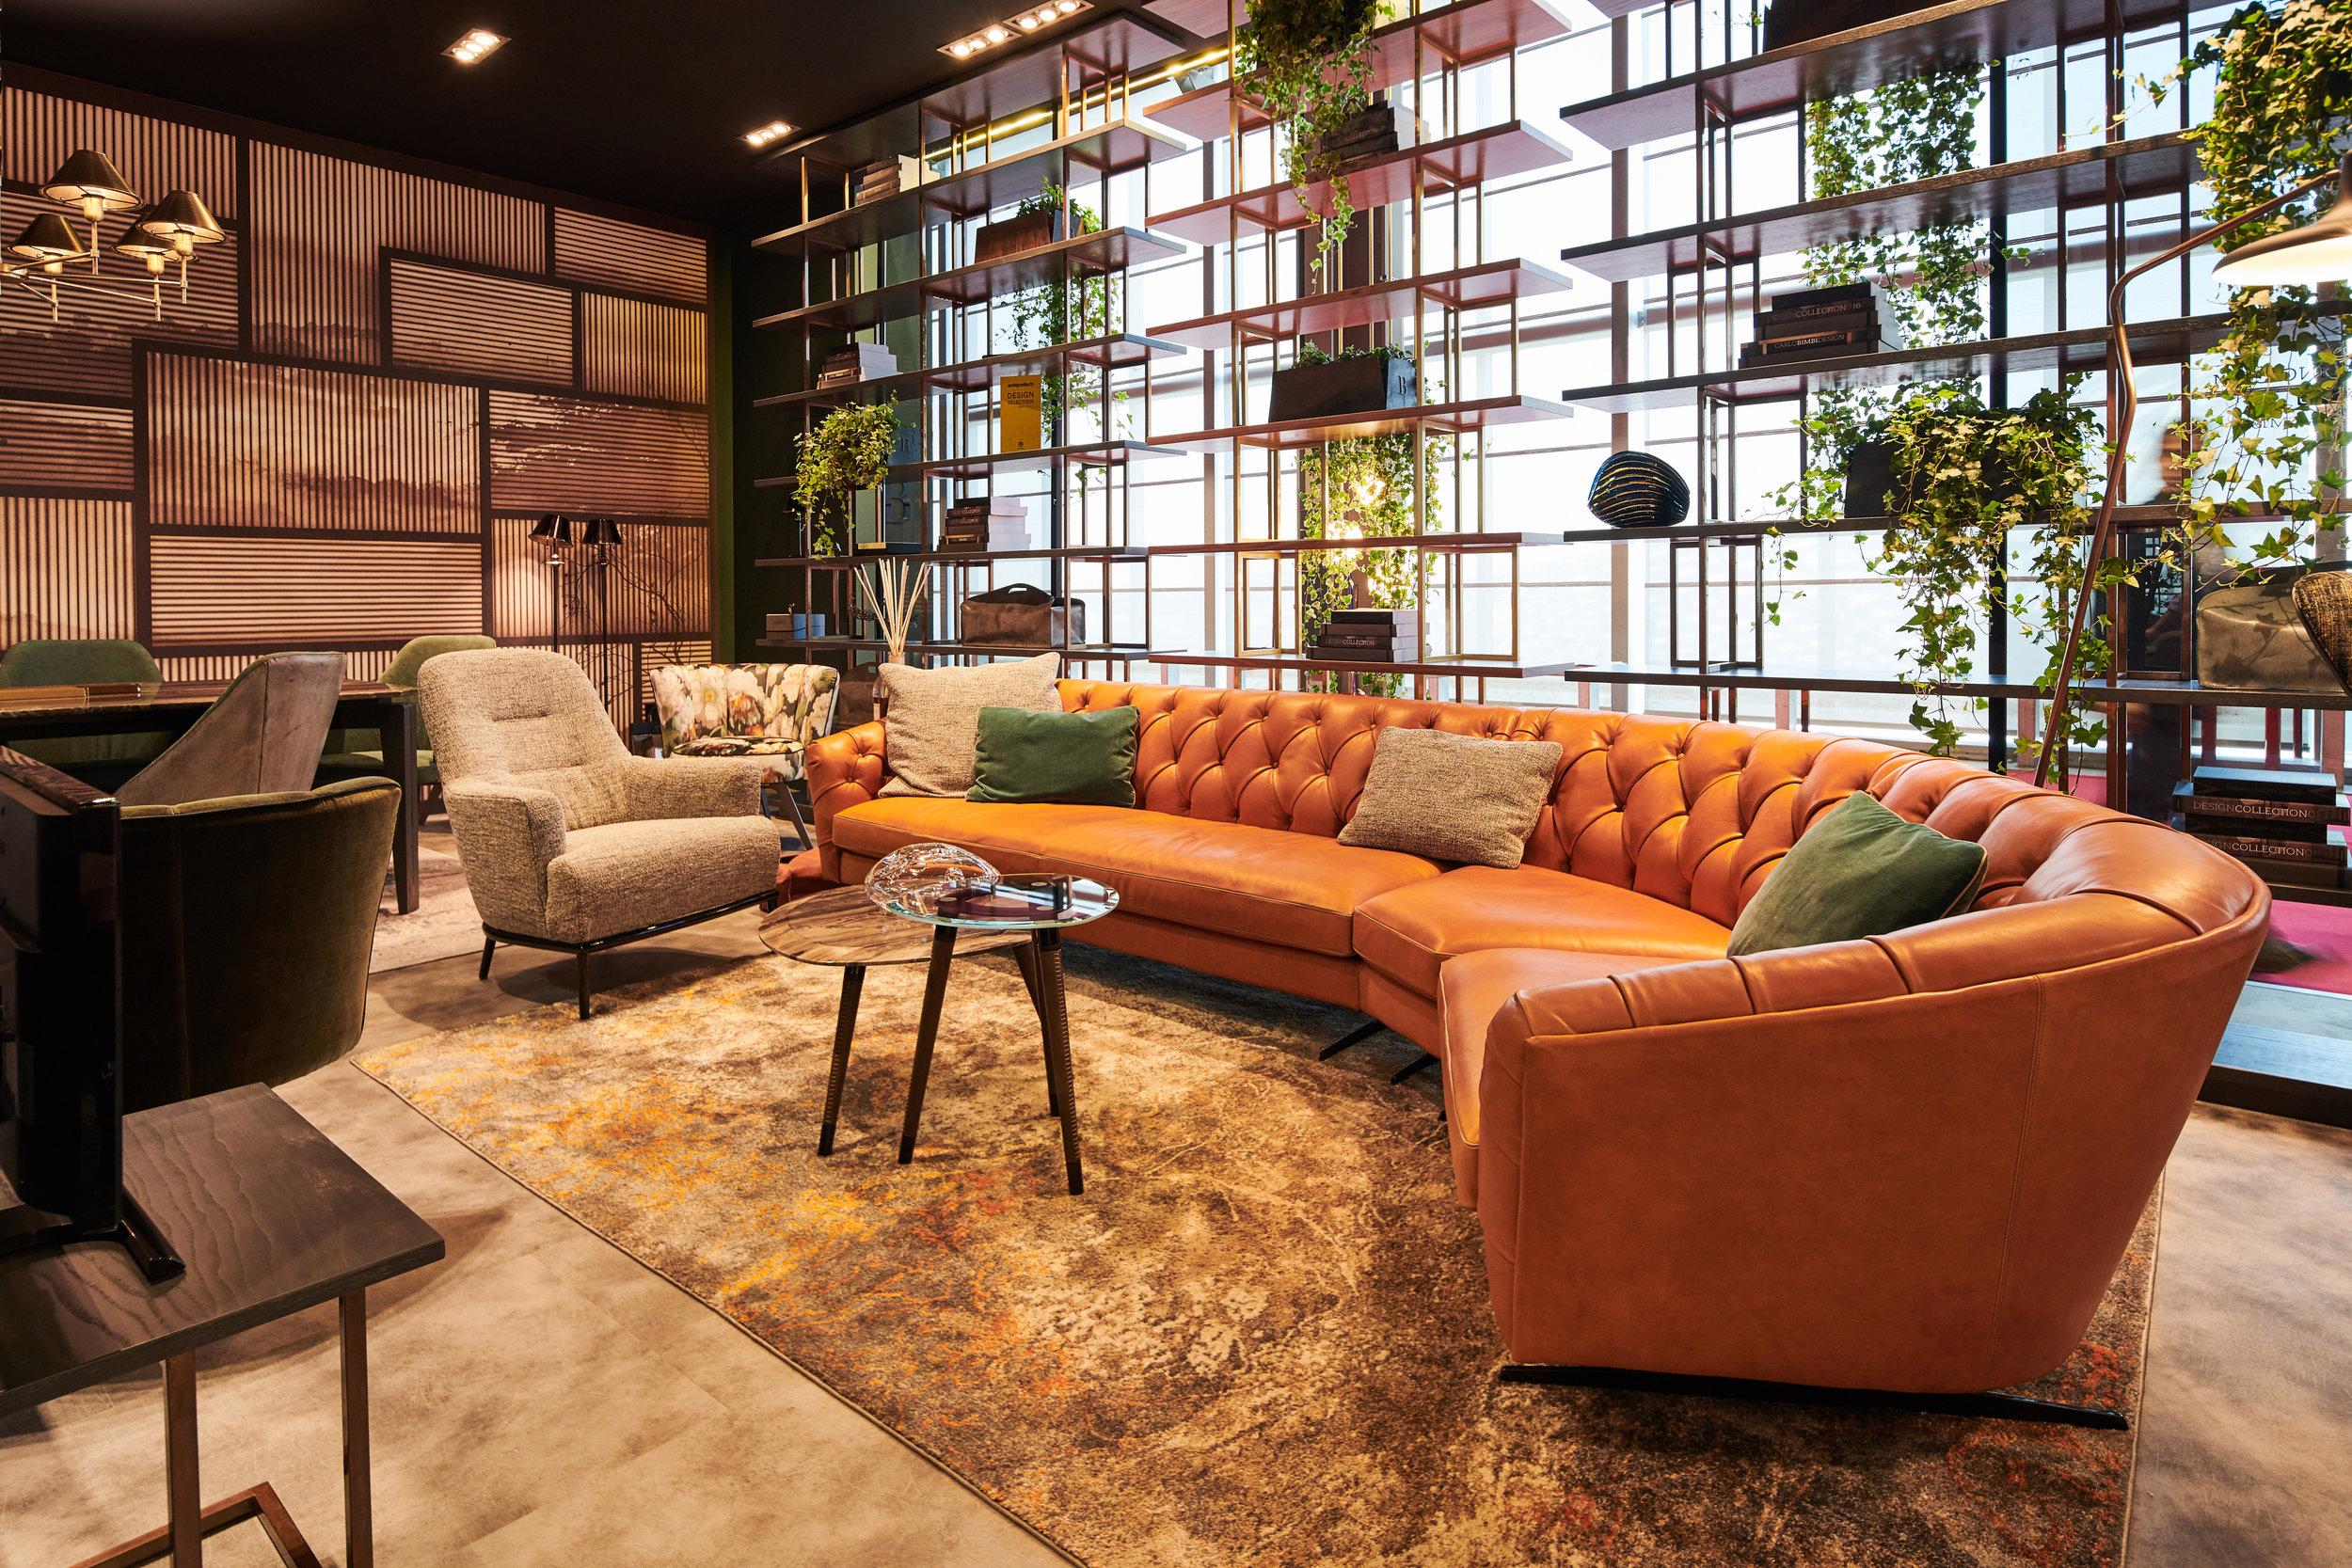 Borzalino New Kap sofa - Masha Shapiro Agency UK.jpg